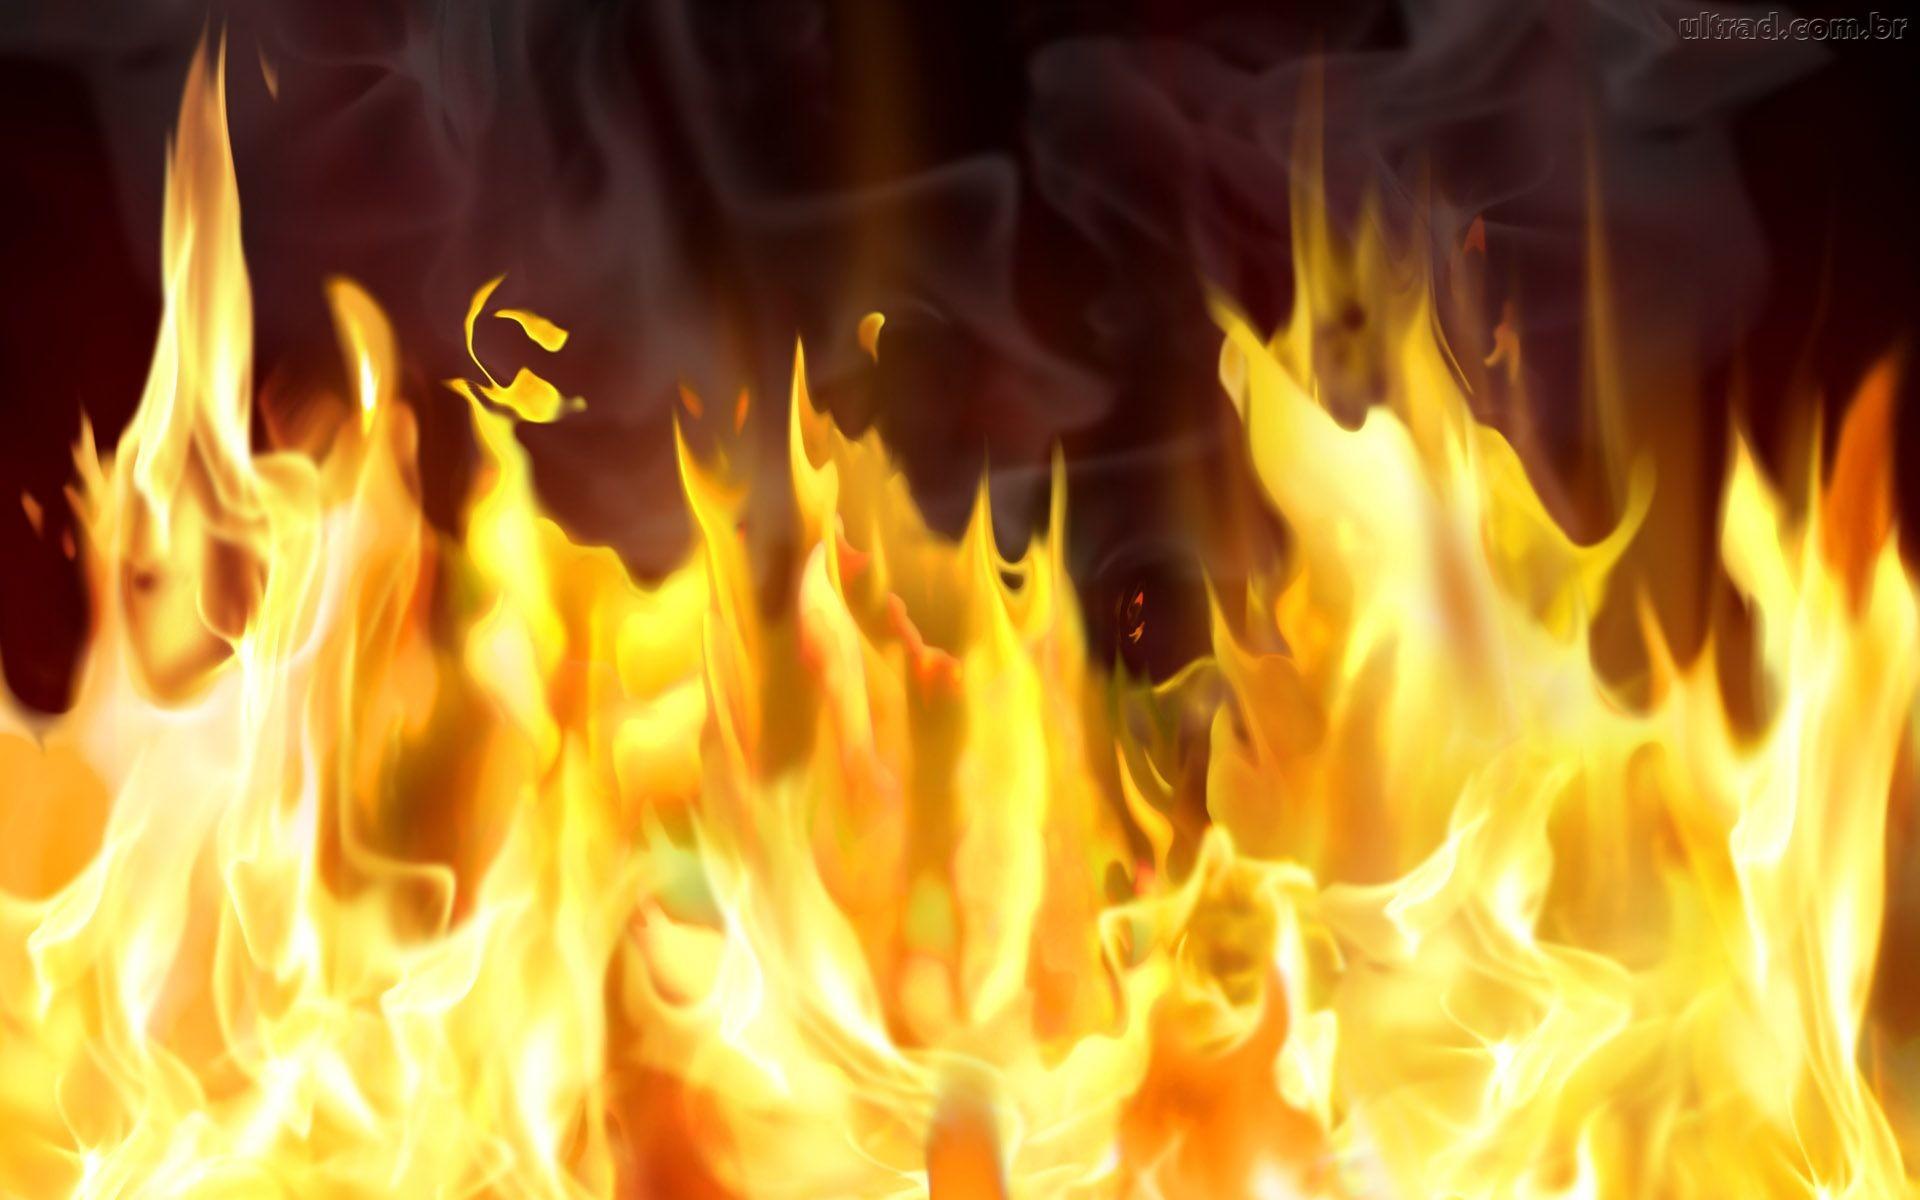 Live Fire Wallpapers for Desktop (46+